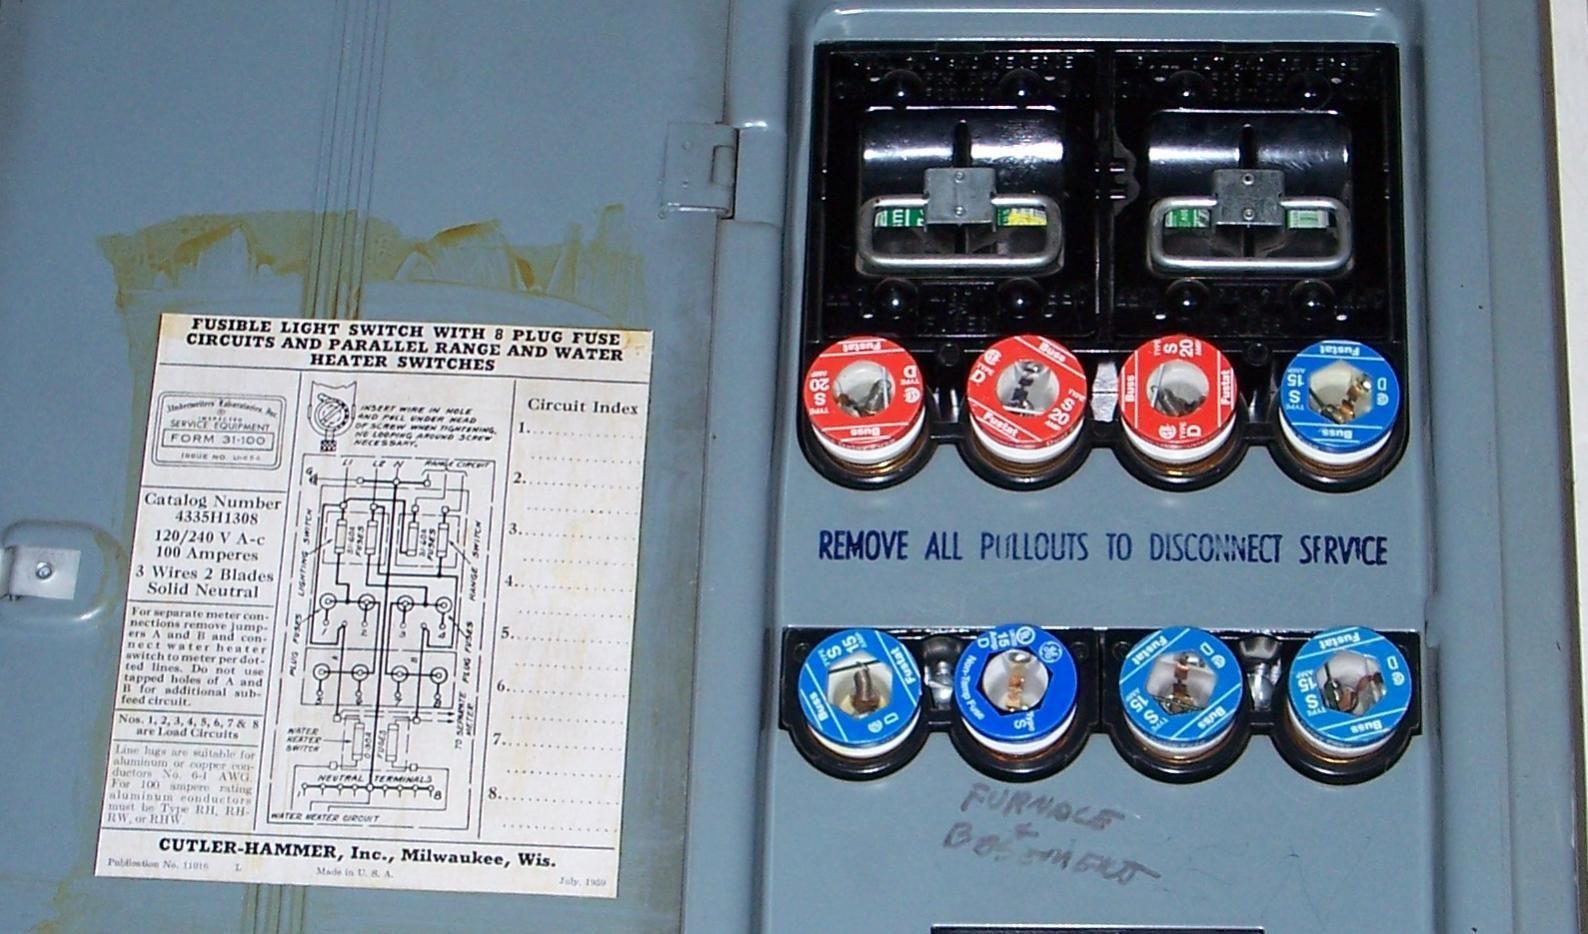 100 Amp Panel Fuse Box in 2020 | Fuse box, Fuse panel ...